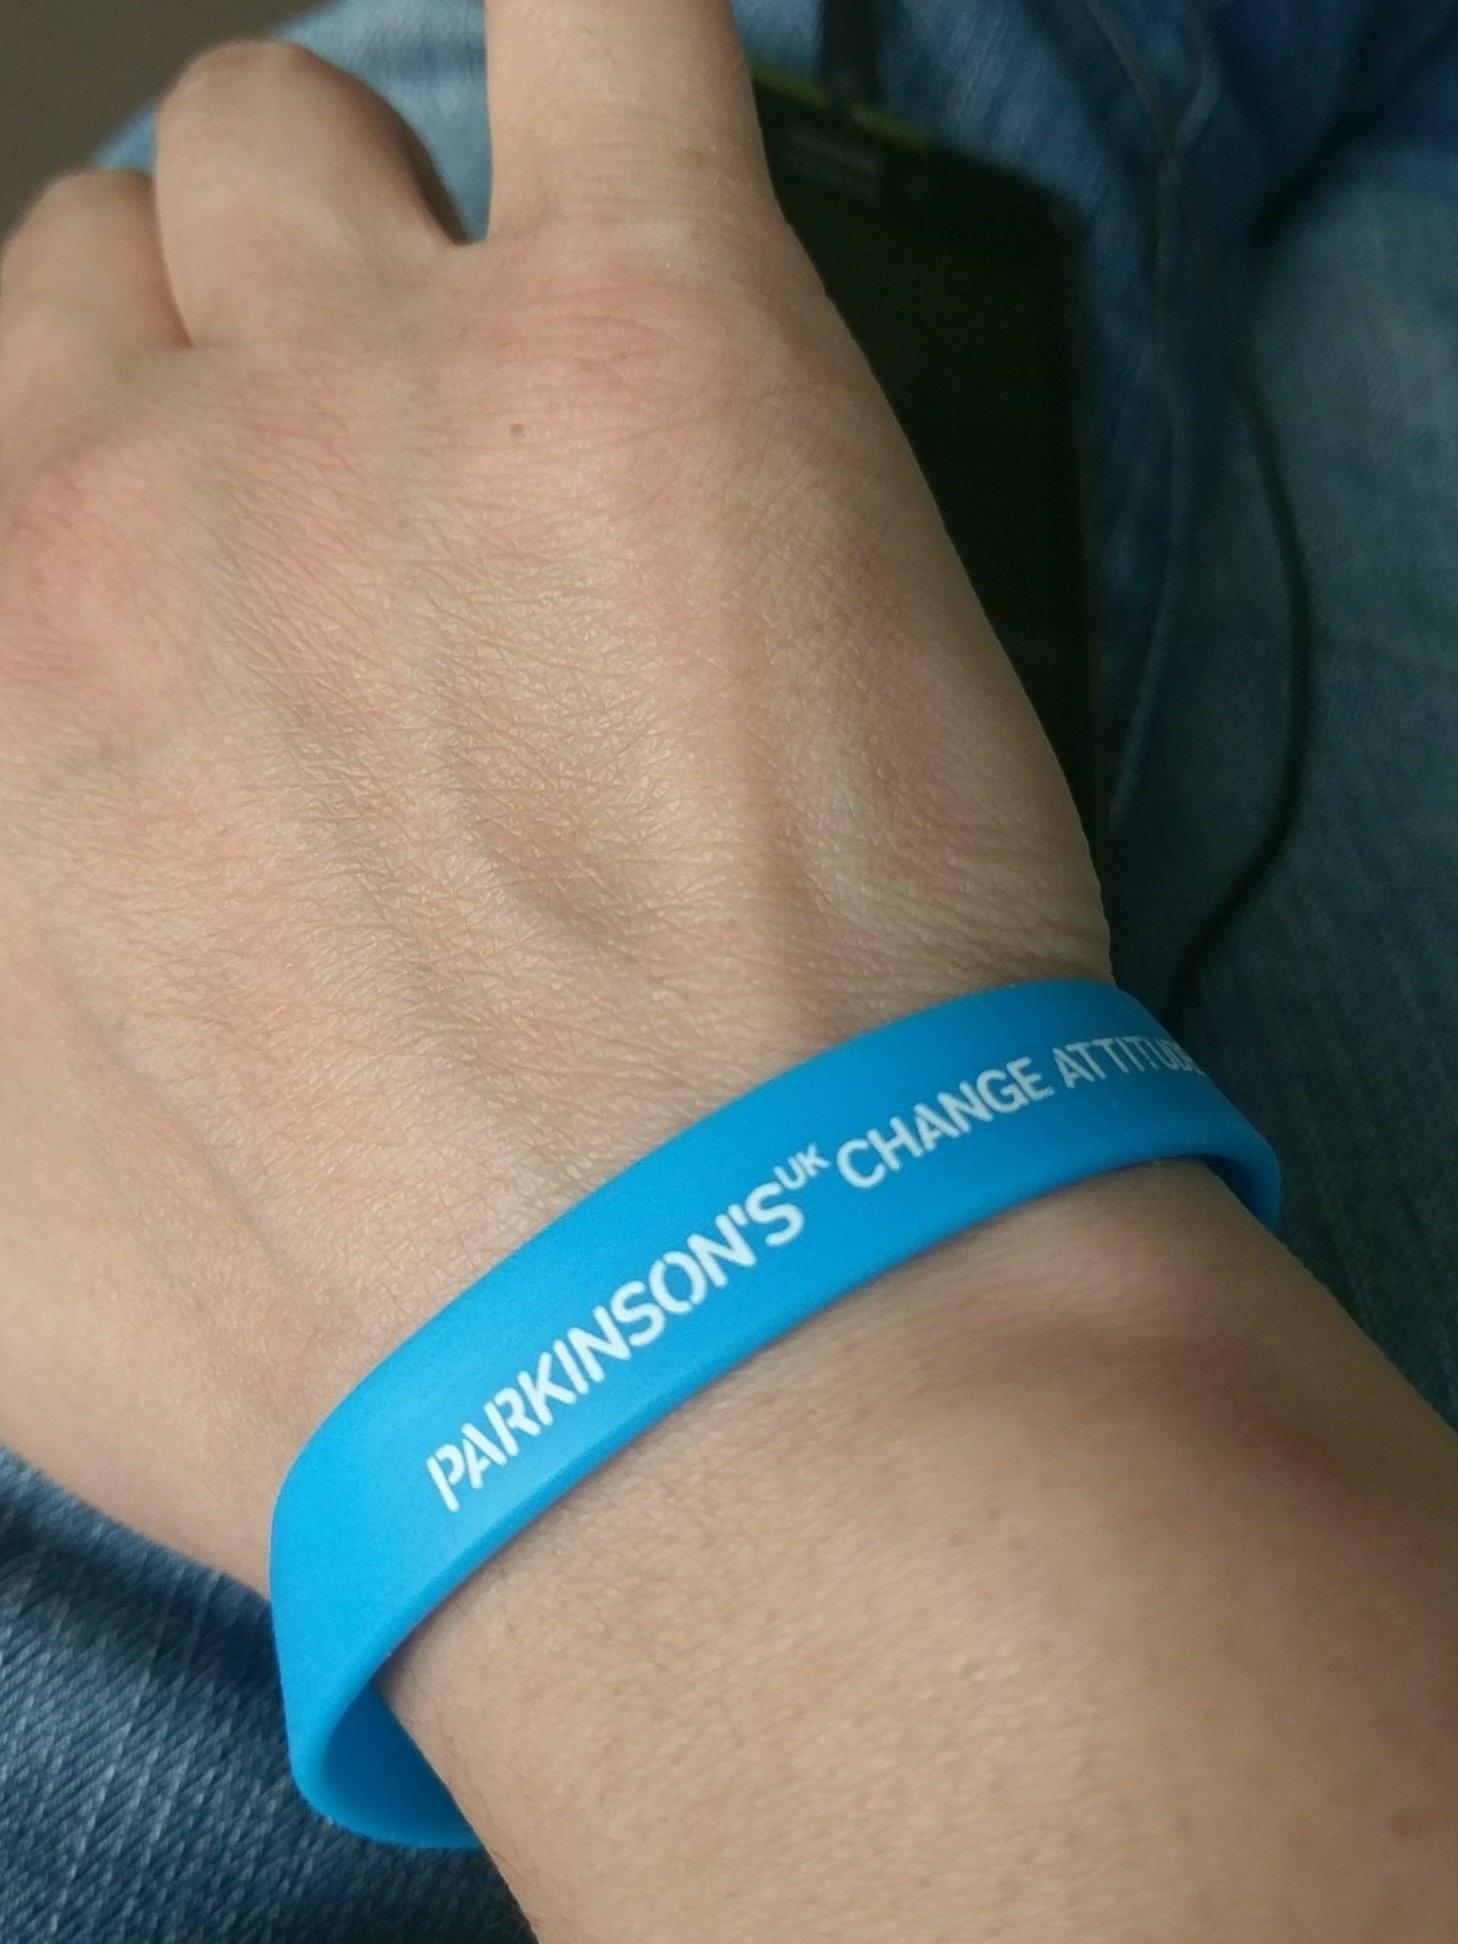 Thank you to all the calming and amazing Nurses @ParkinsonsUK 👏 #InternationalNursesDay https://t.co/FMxxsjTokq